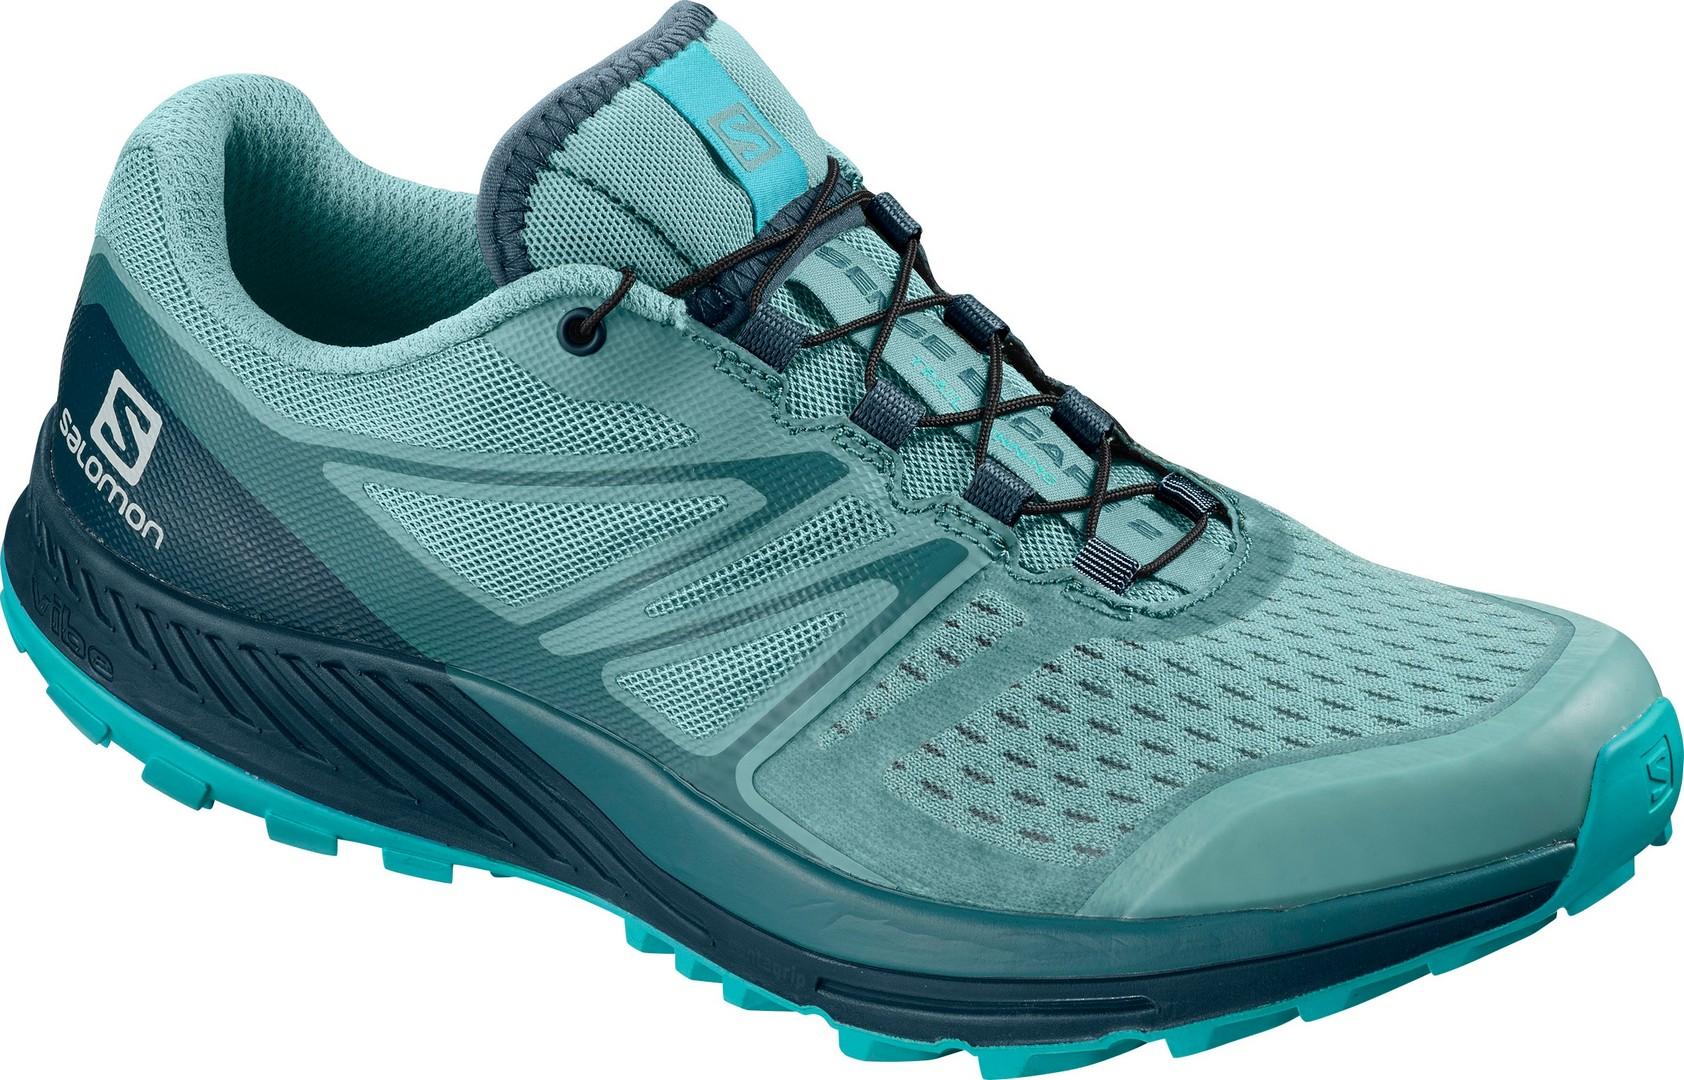 Salomon SENSE ESCAPE 2 W, ženski tekaški copati, modra